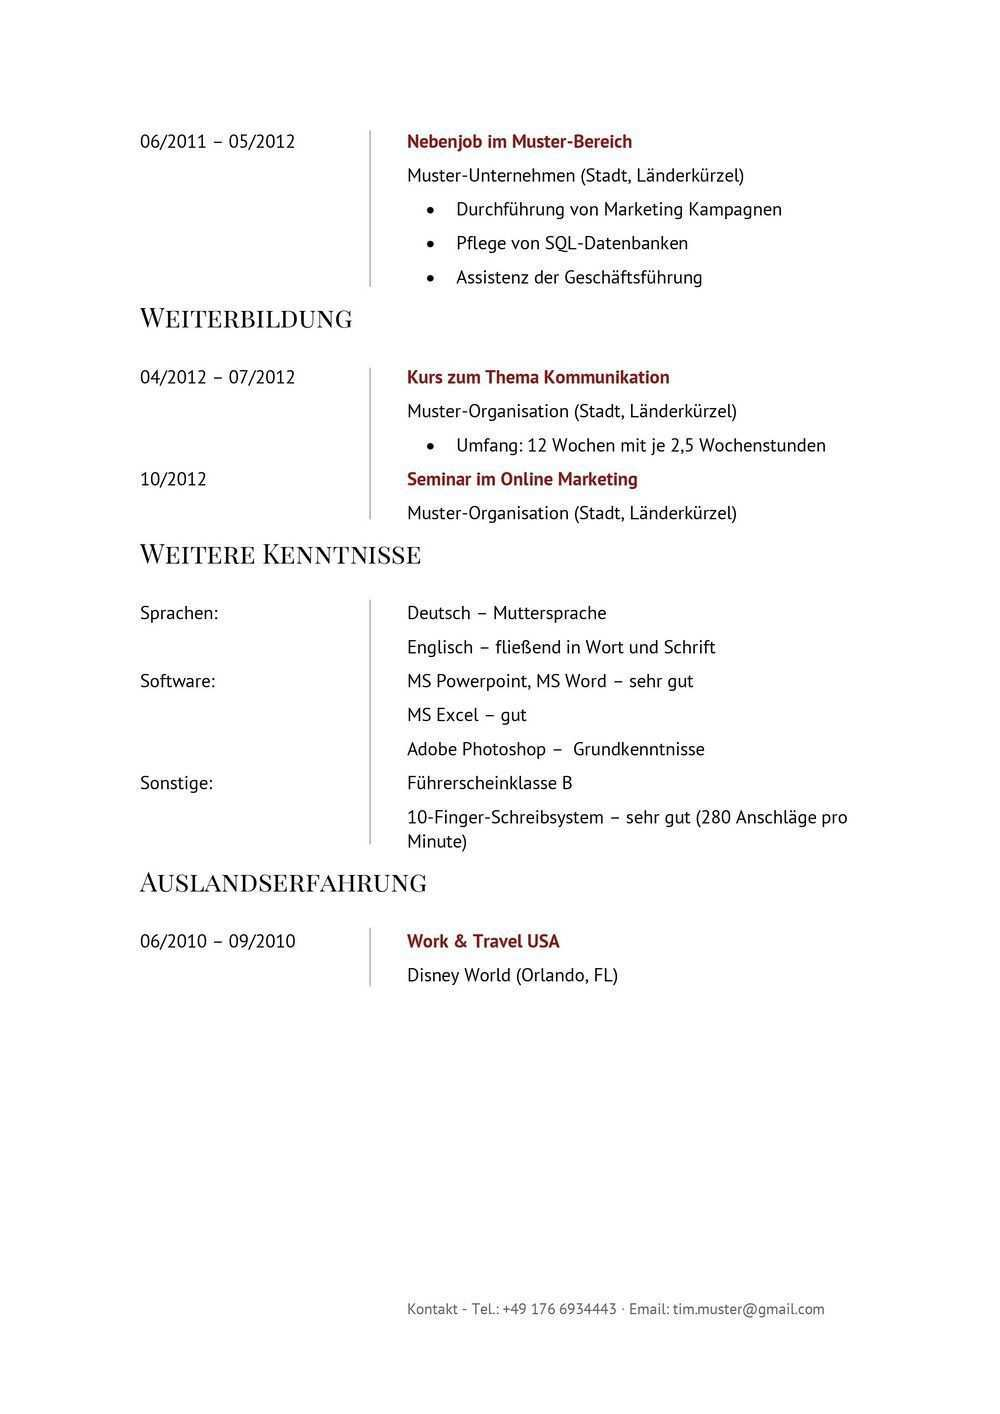 Lebenslauf Muster Vorlage Manager 2 Lebenslauf Vorlagen Lebenslauf Lebenslauf Muster